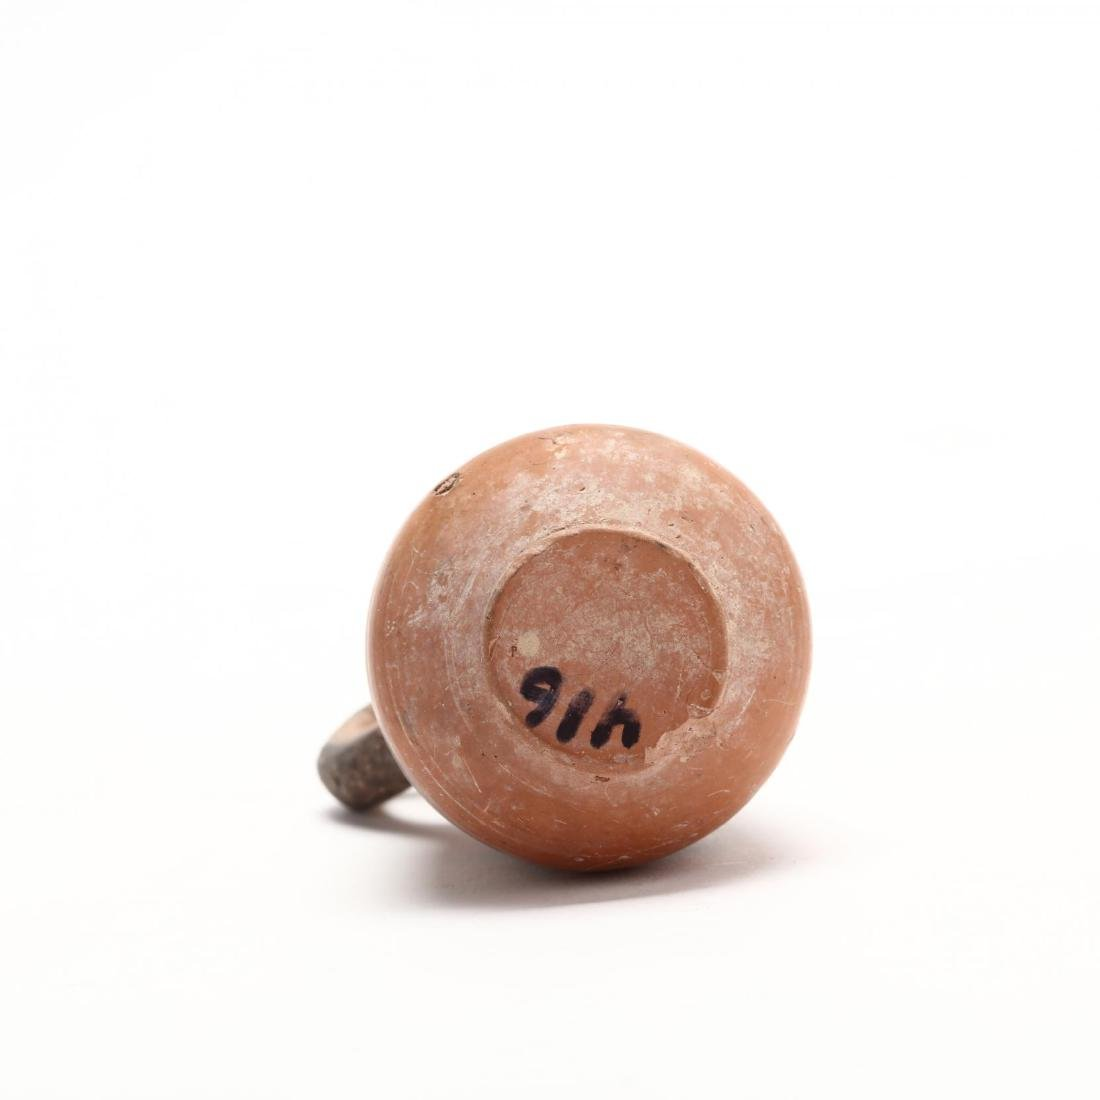 Cypro-Phoenician Iron Age Red Ware Juglet - 5